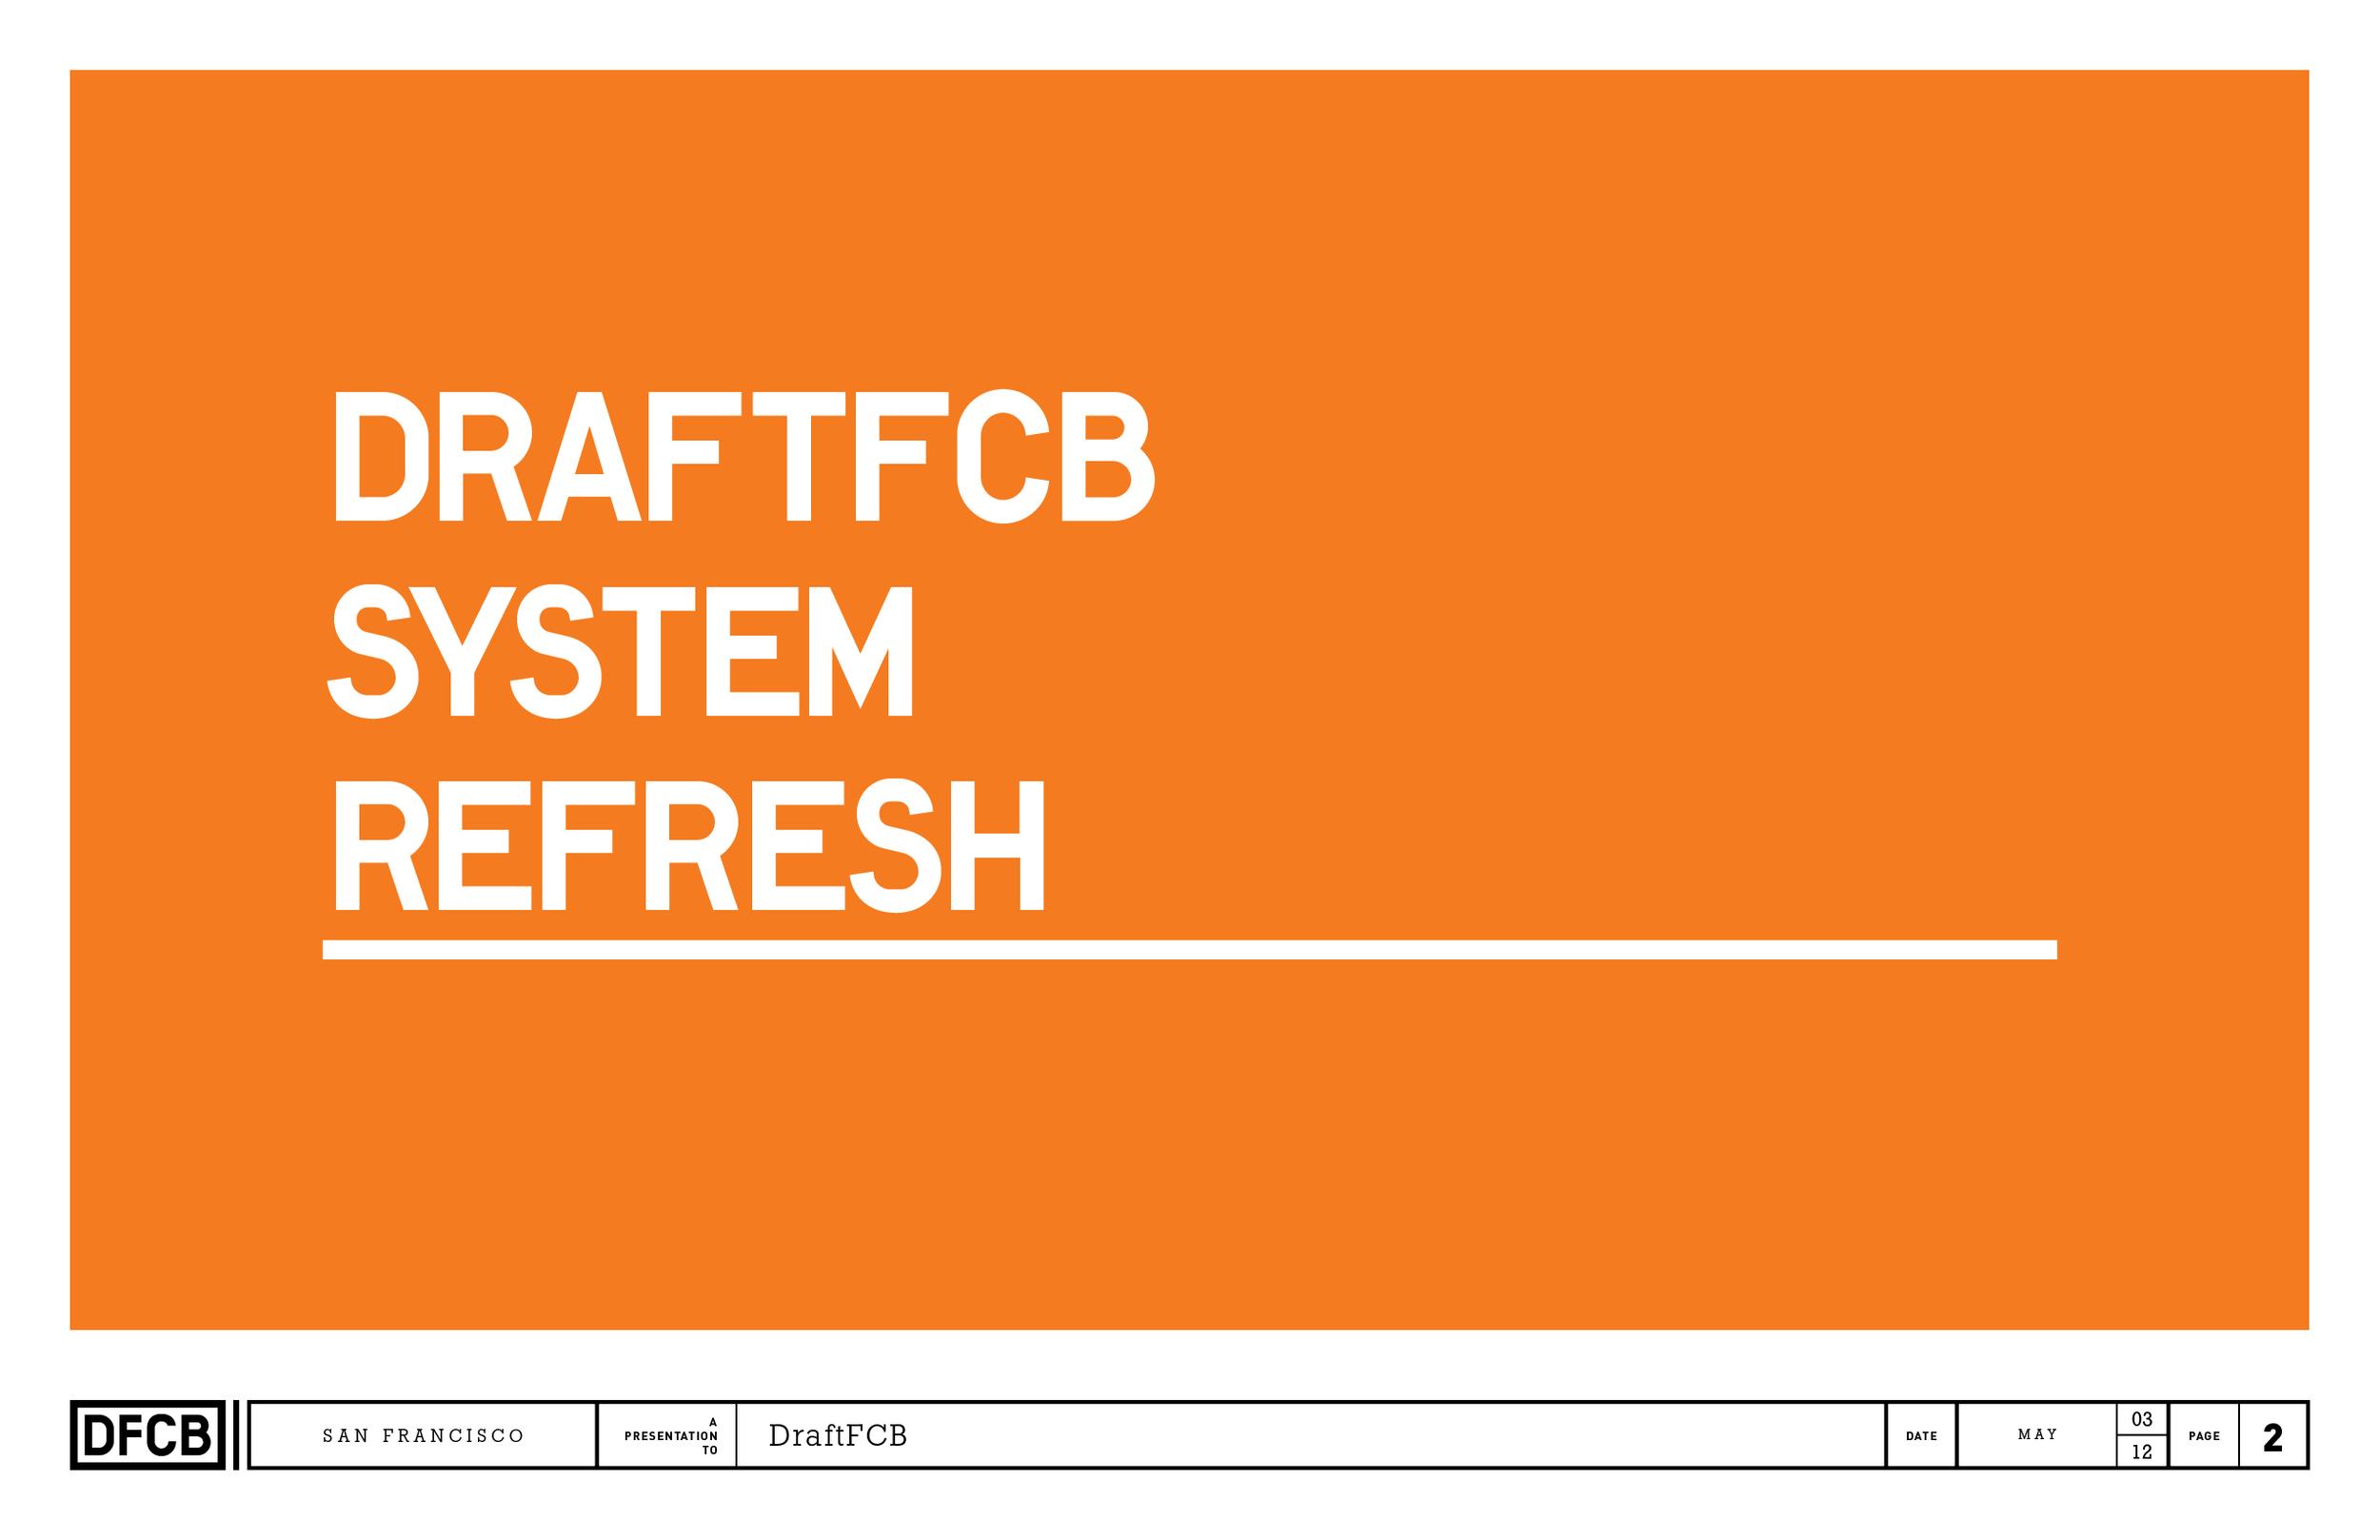 DraftFCB_system_REfresh_rnd12.jpg